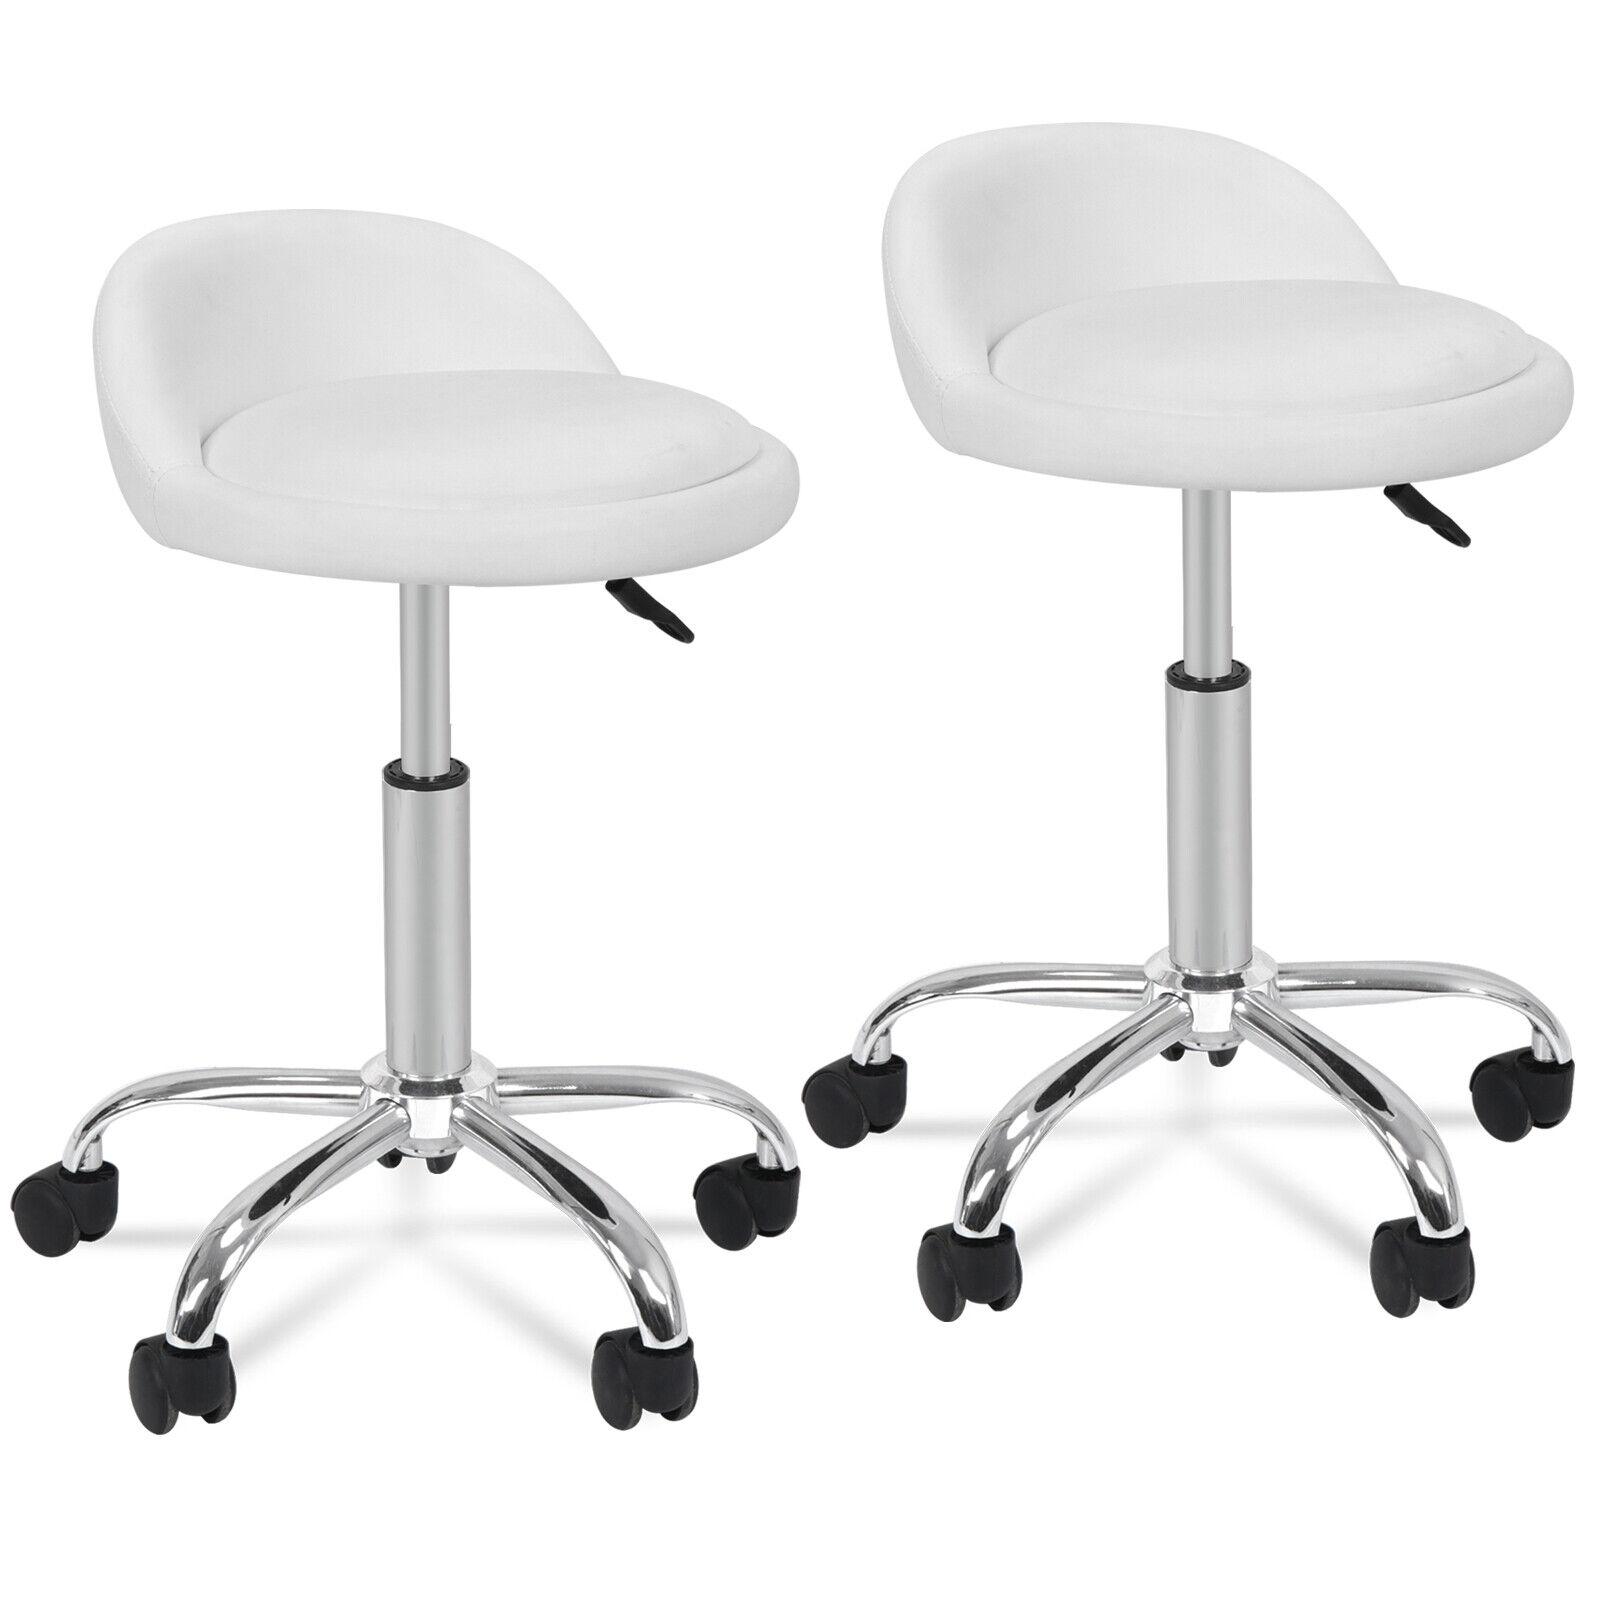 2X Salon Stools w/Back Rest Saddle Hydraulic Adjustable Spa Rolling Medical Health & Beauty